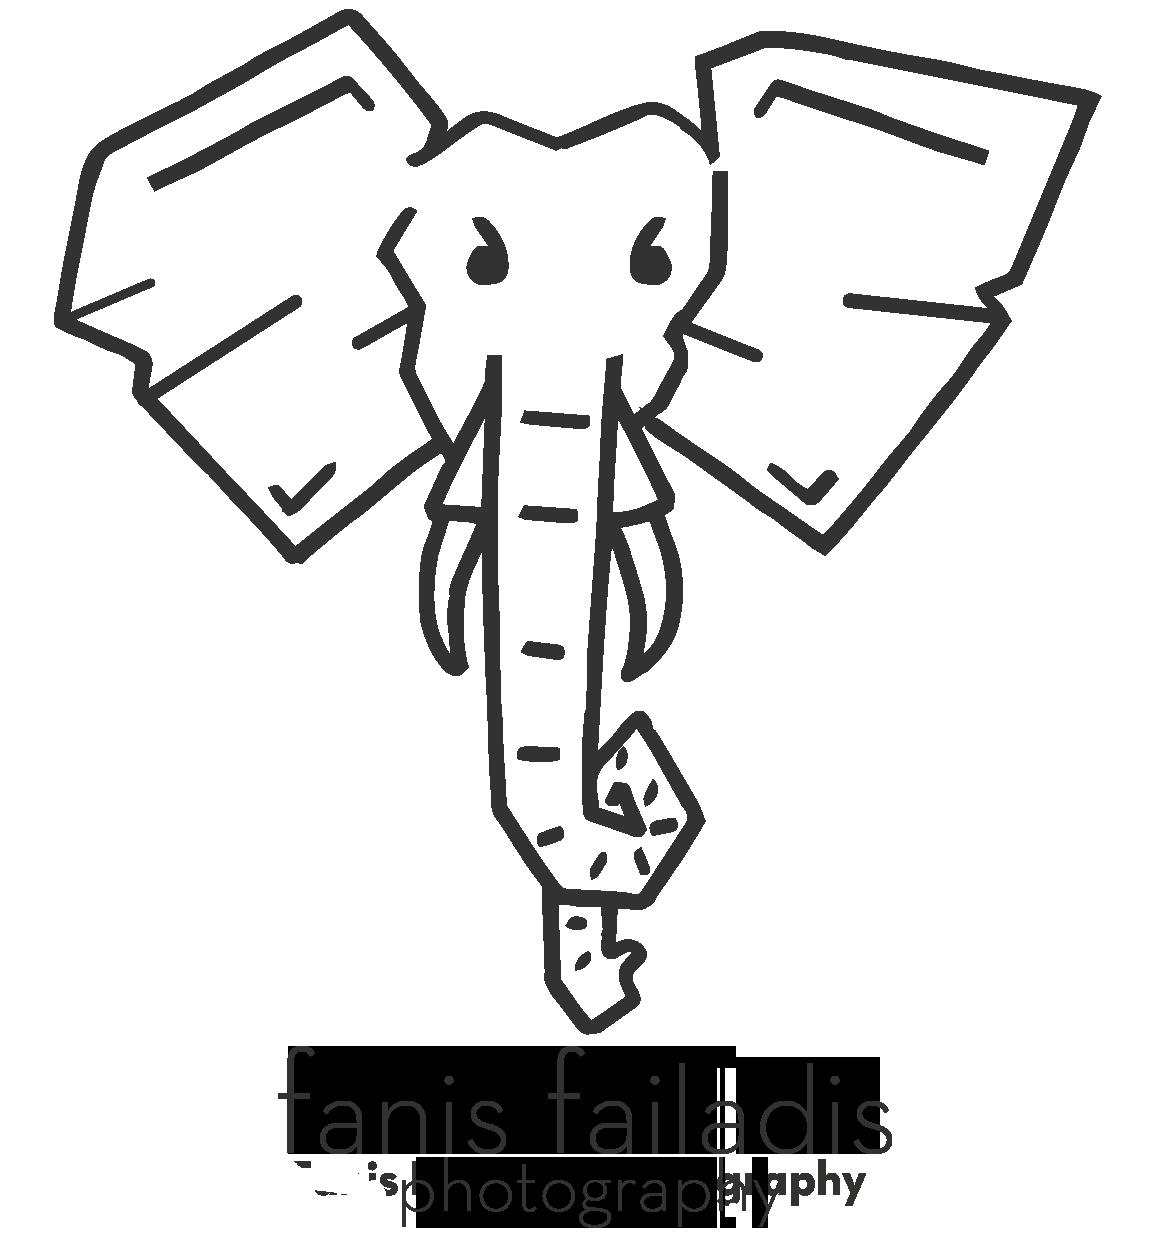 FanisFailadis